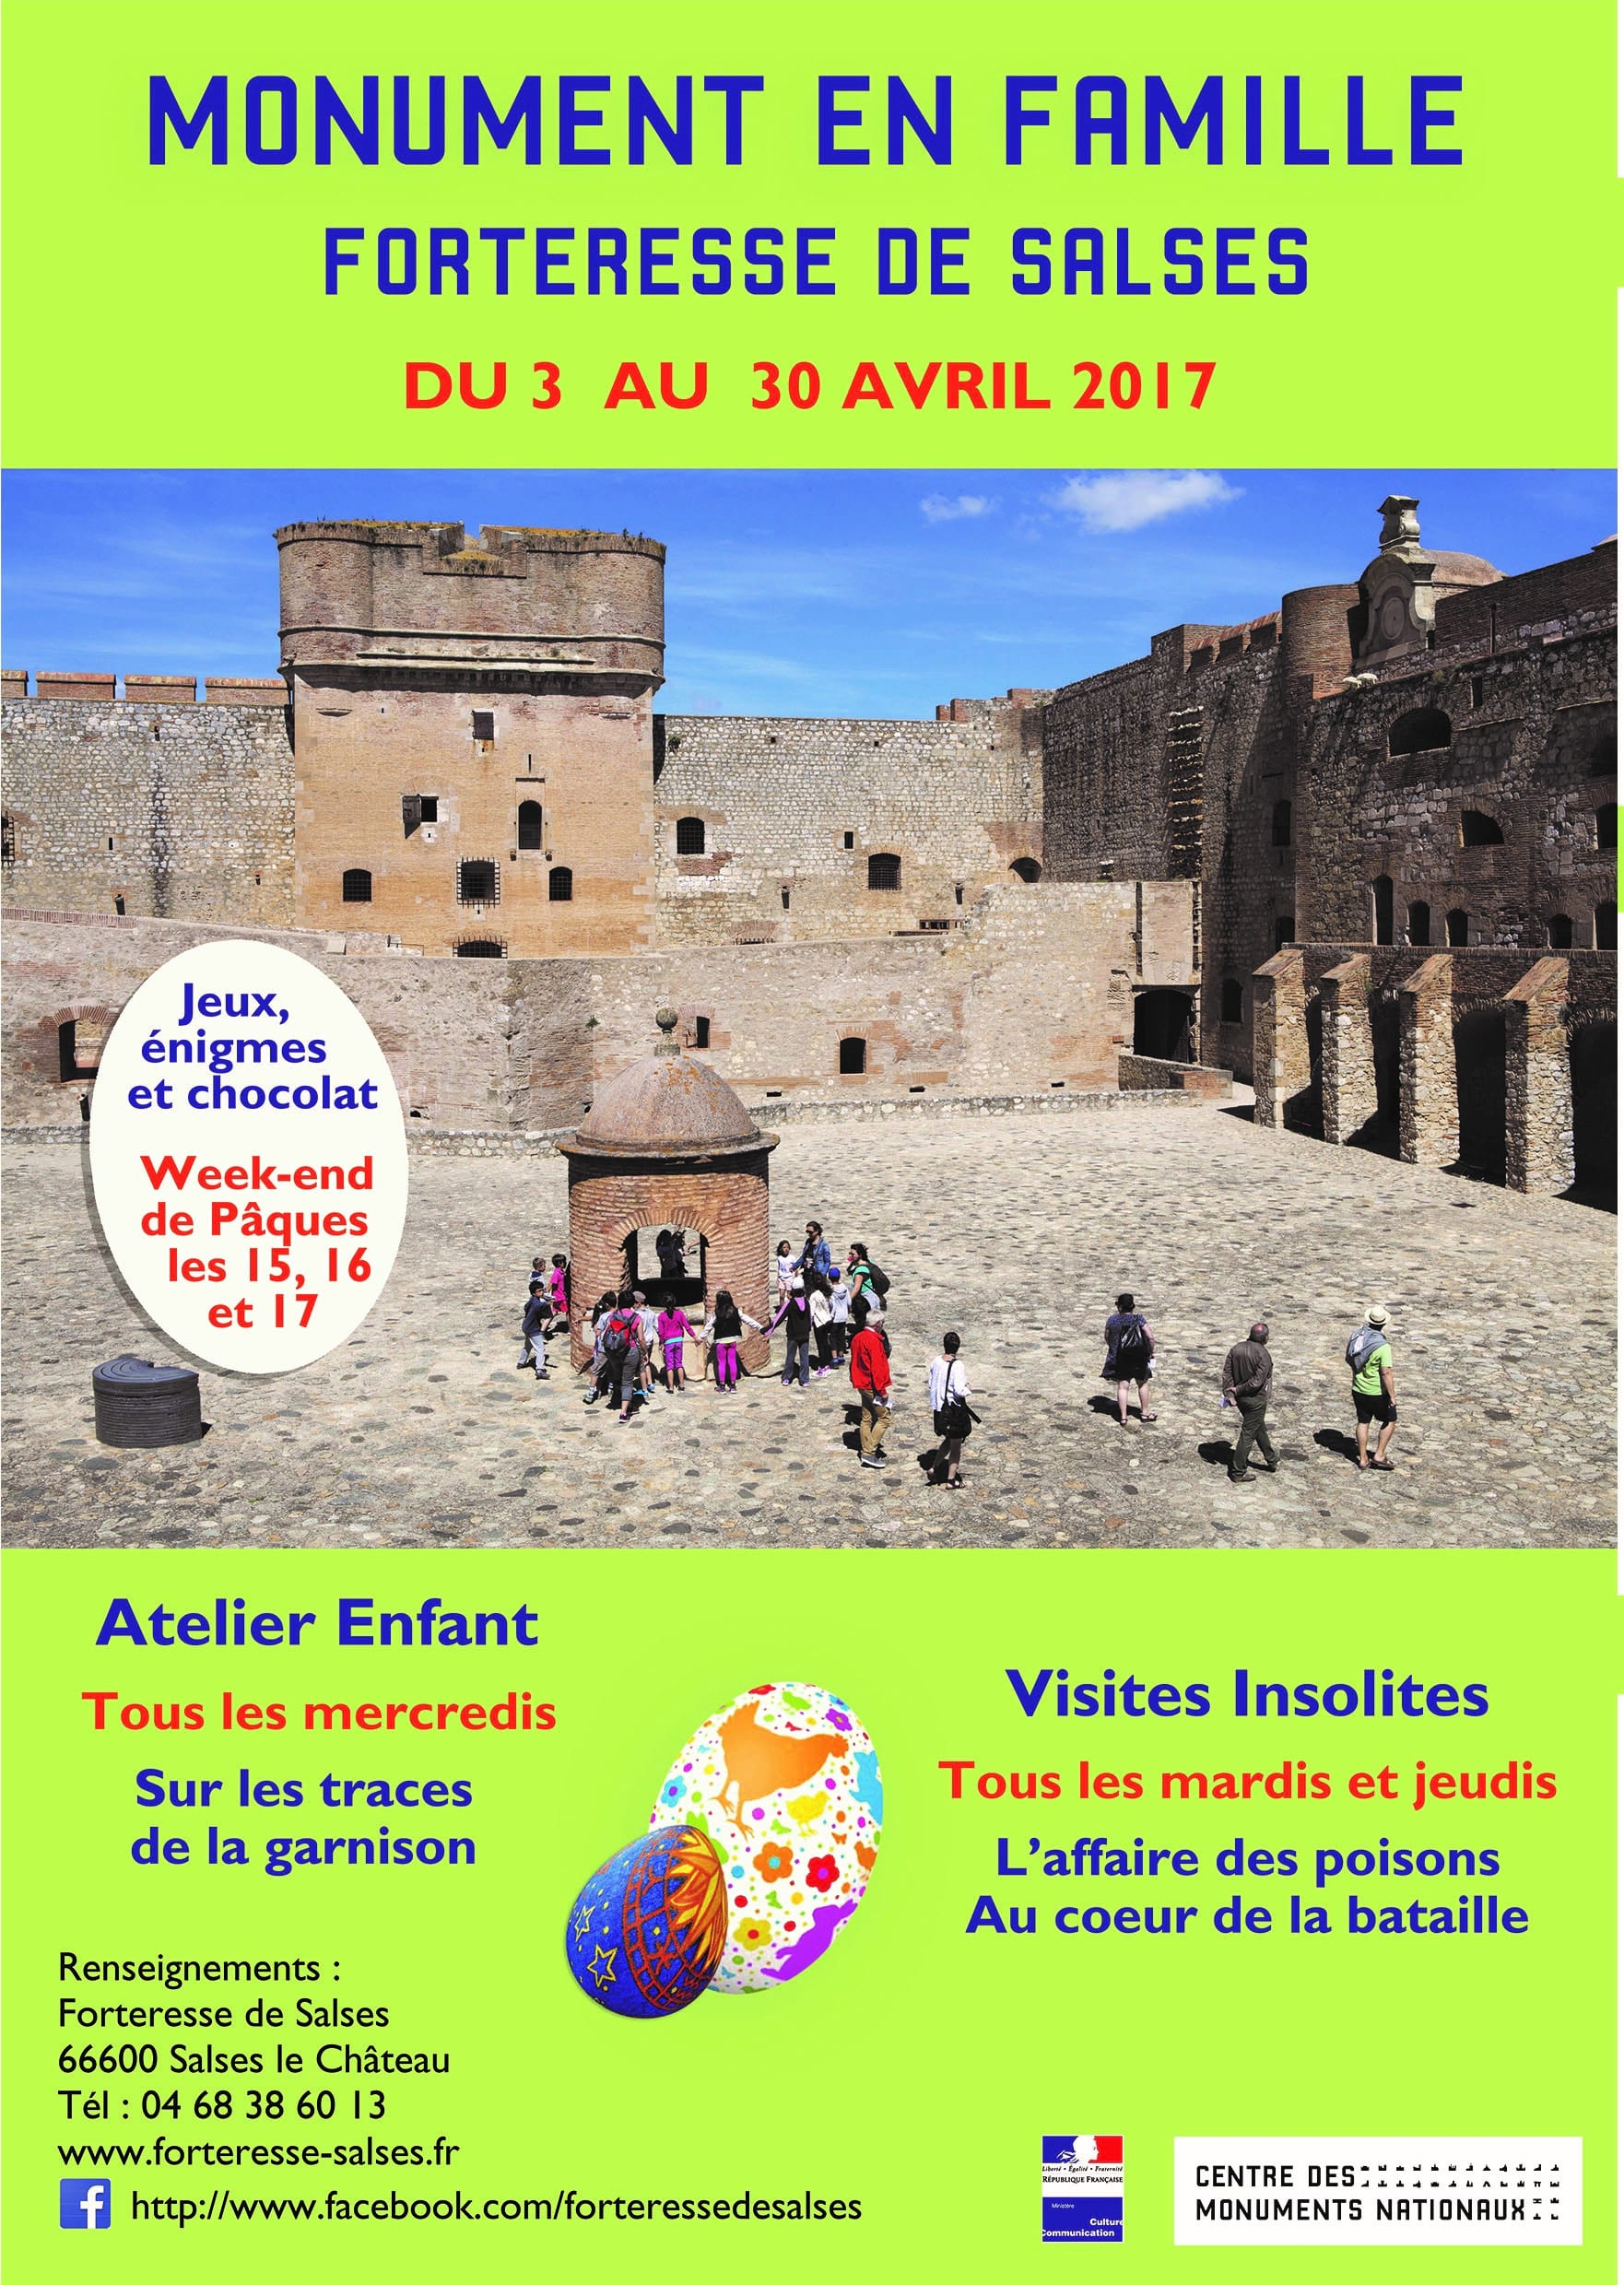 April activities at the Fortresse de Salses